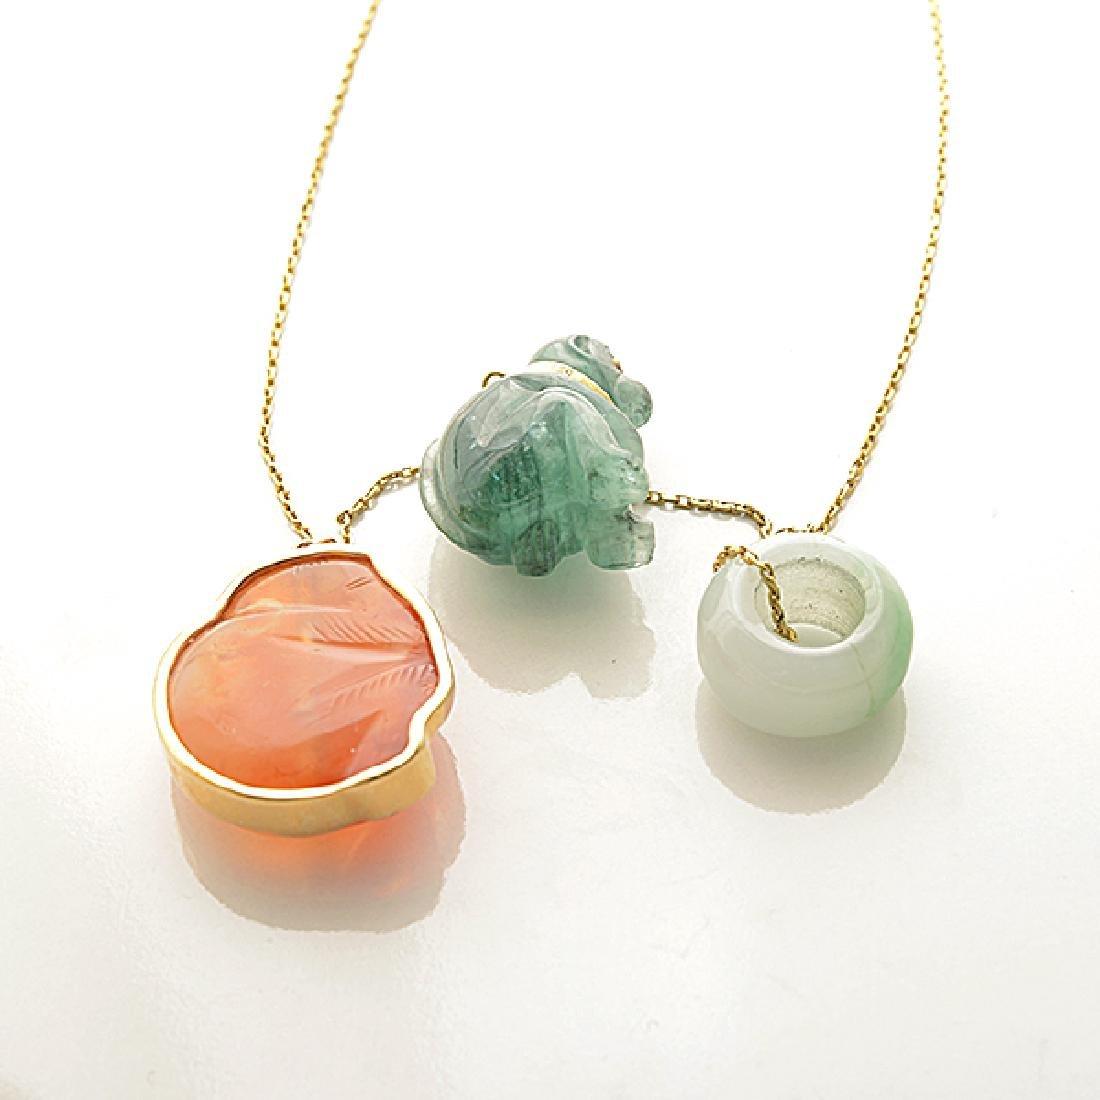 Multi-Stone, Diamond, Yellow Gold Pendant Necklace. - 5